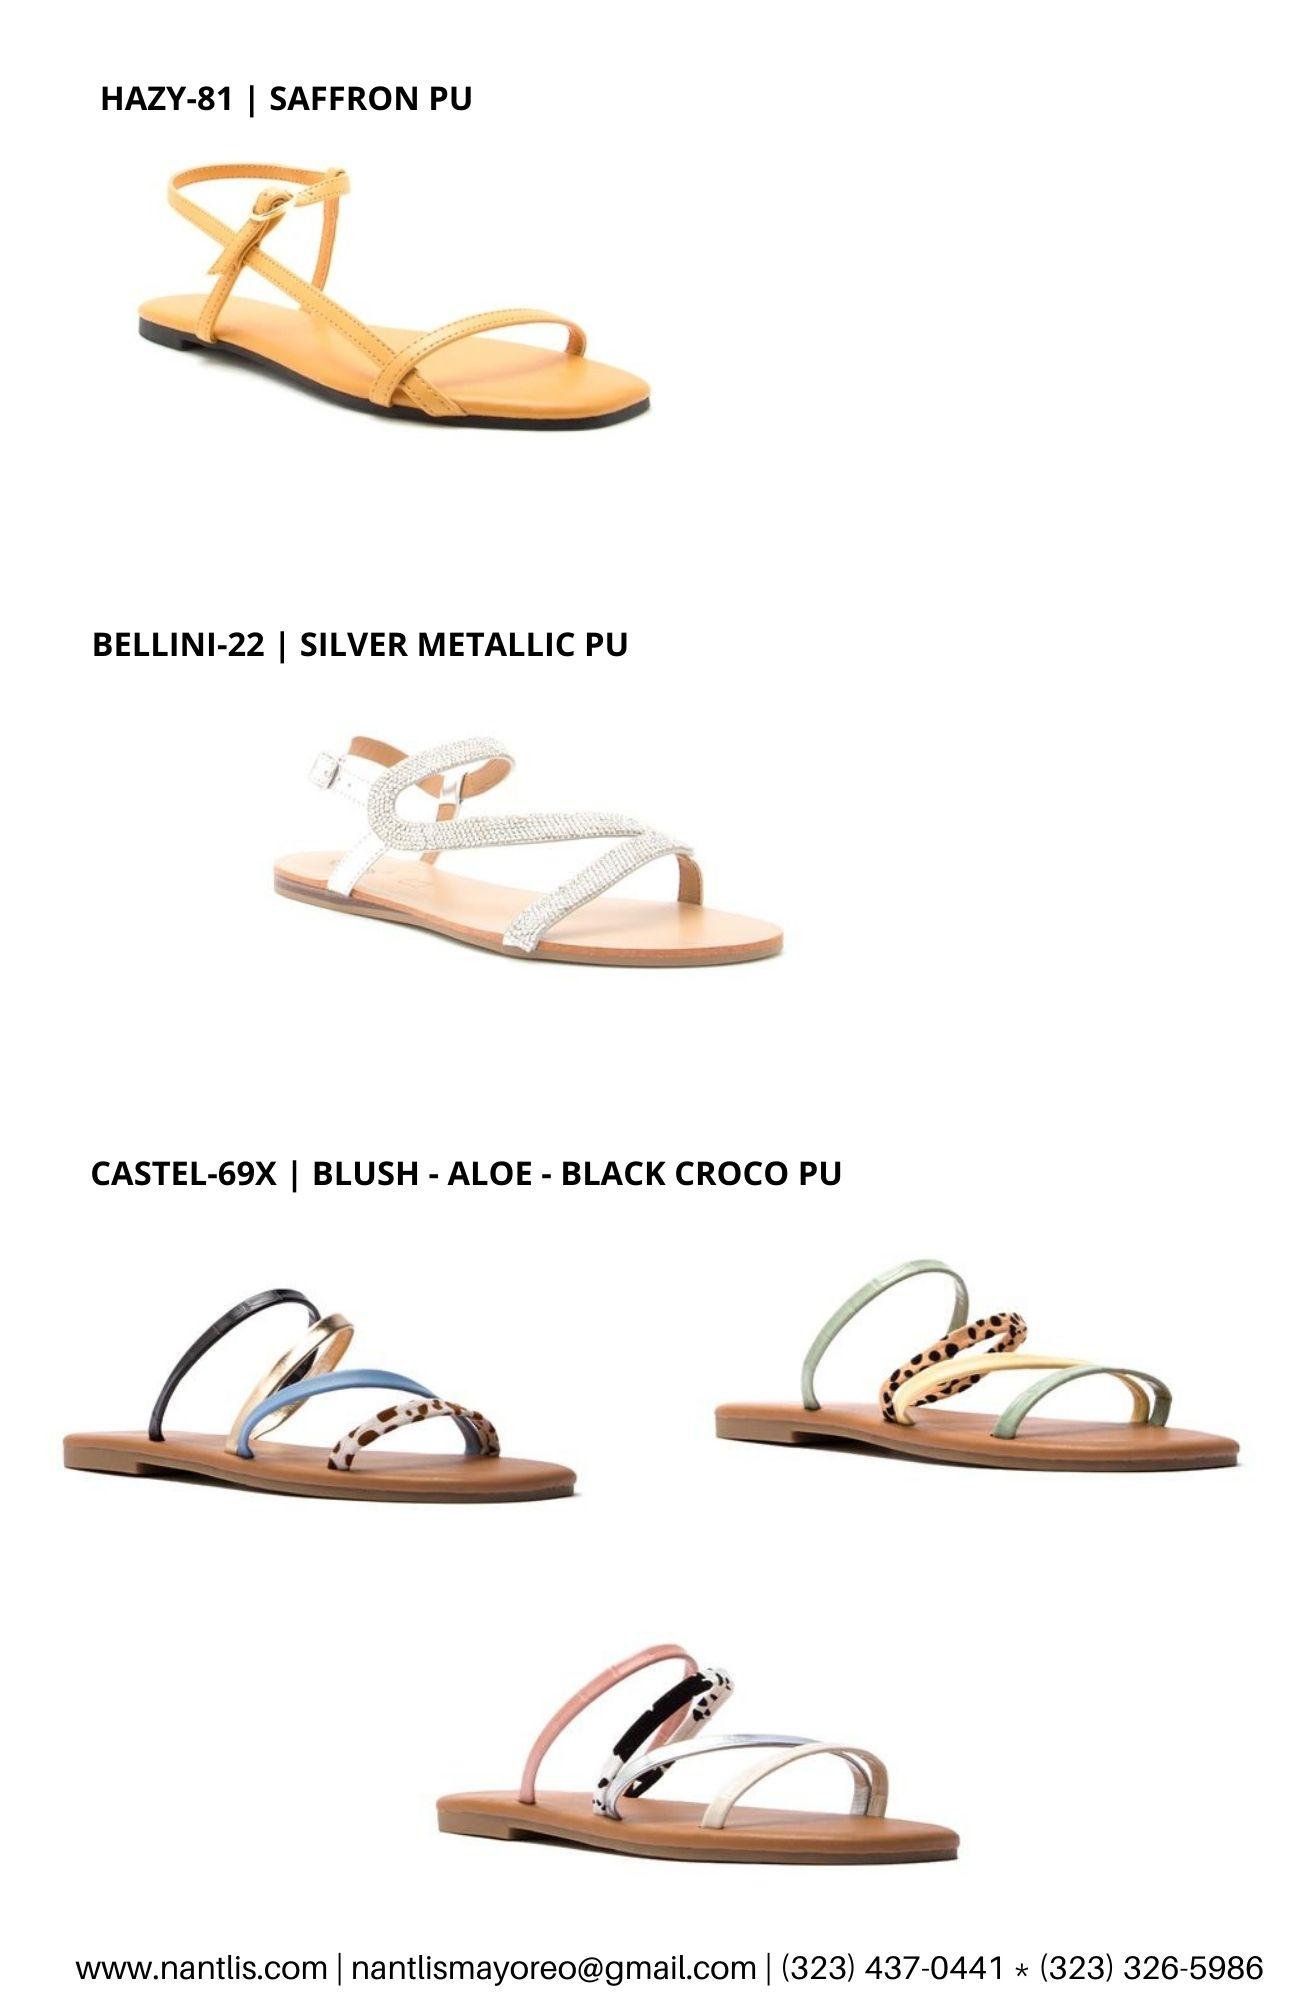 Catalogo Vol QU44 Sandalias de mujer mayoreo Wholesale Sandals page 08